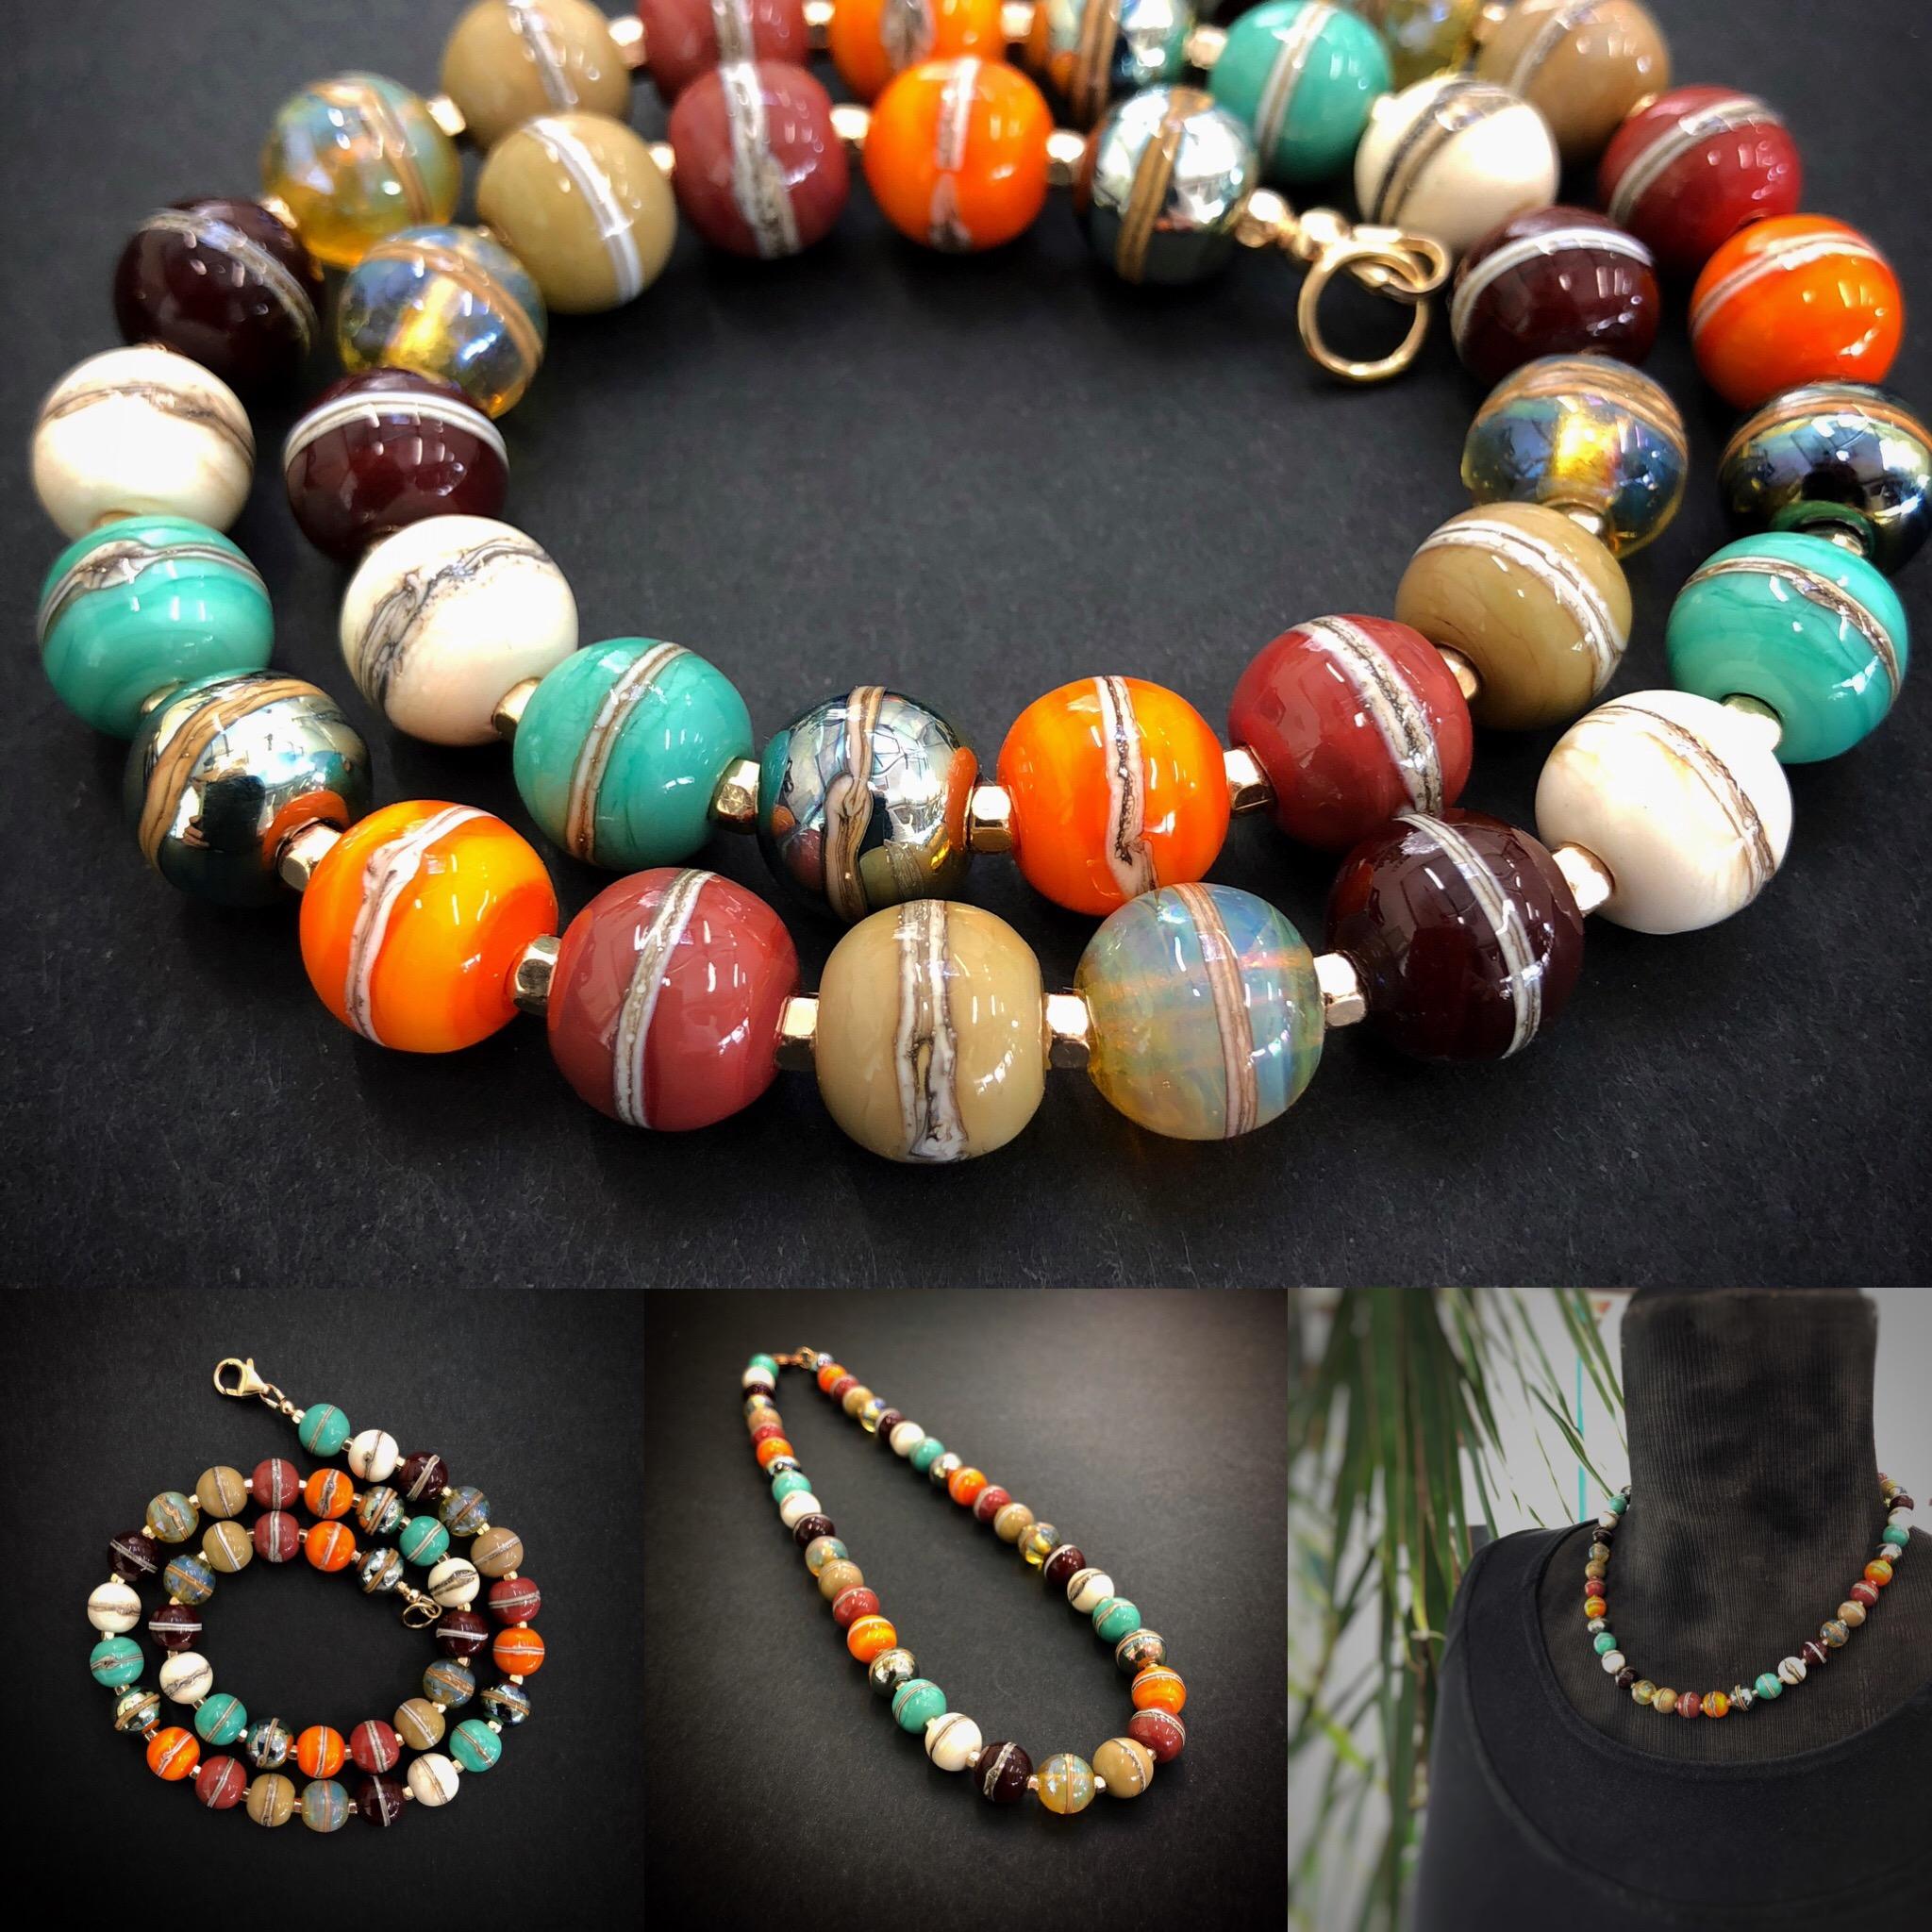 Lampwork bead necklace - Nalda Hoskins.jpg